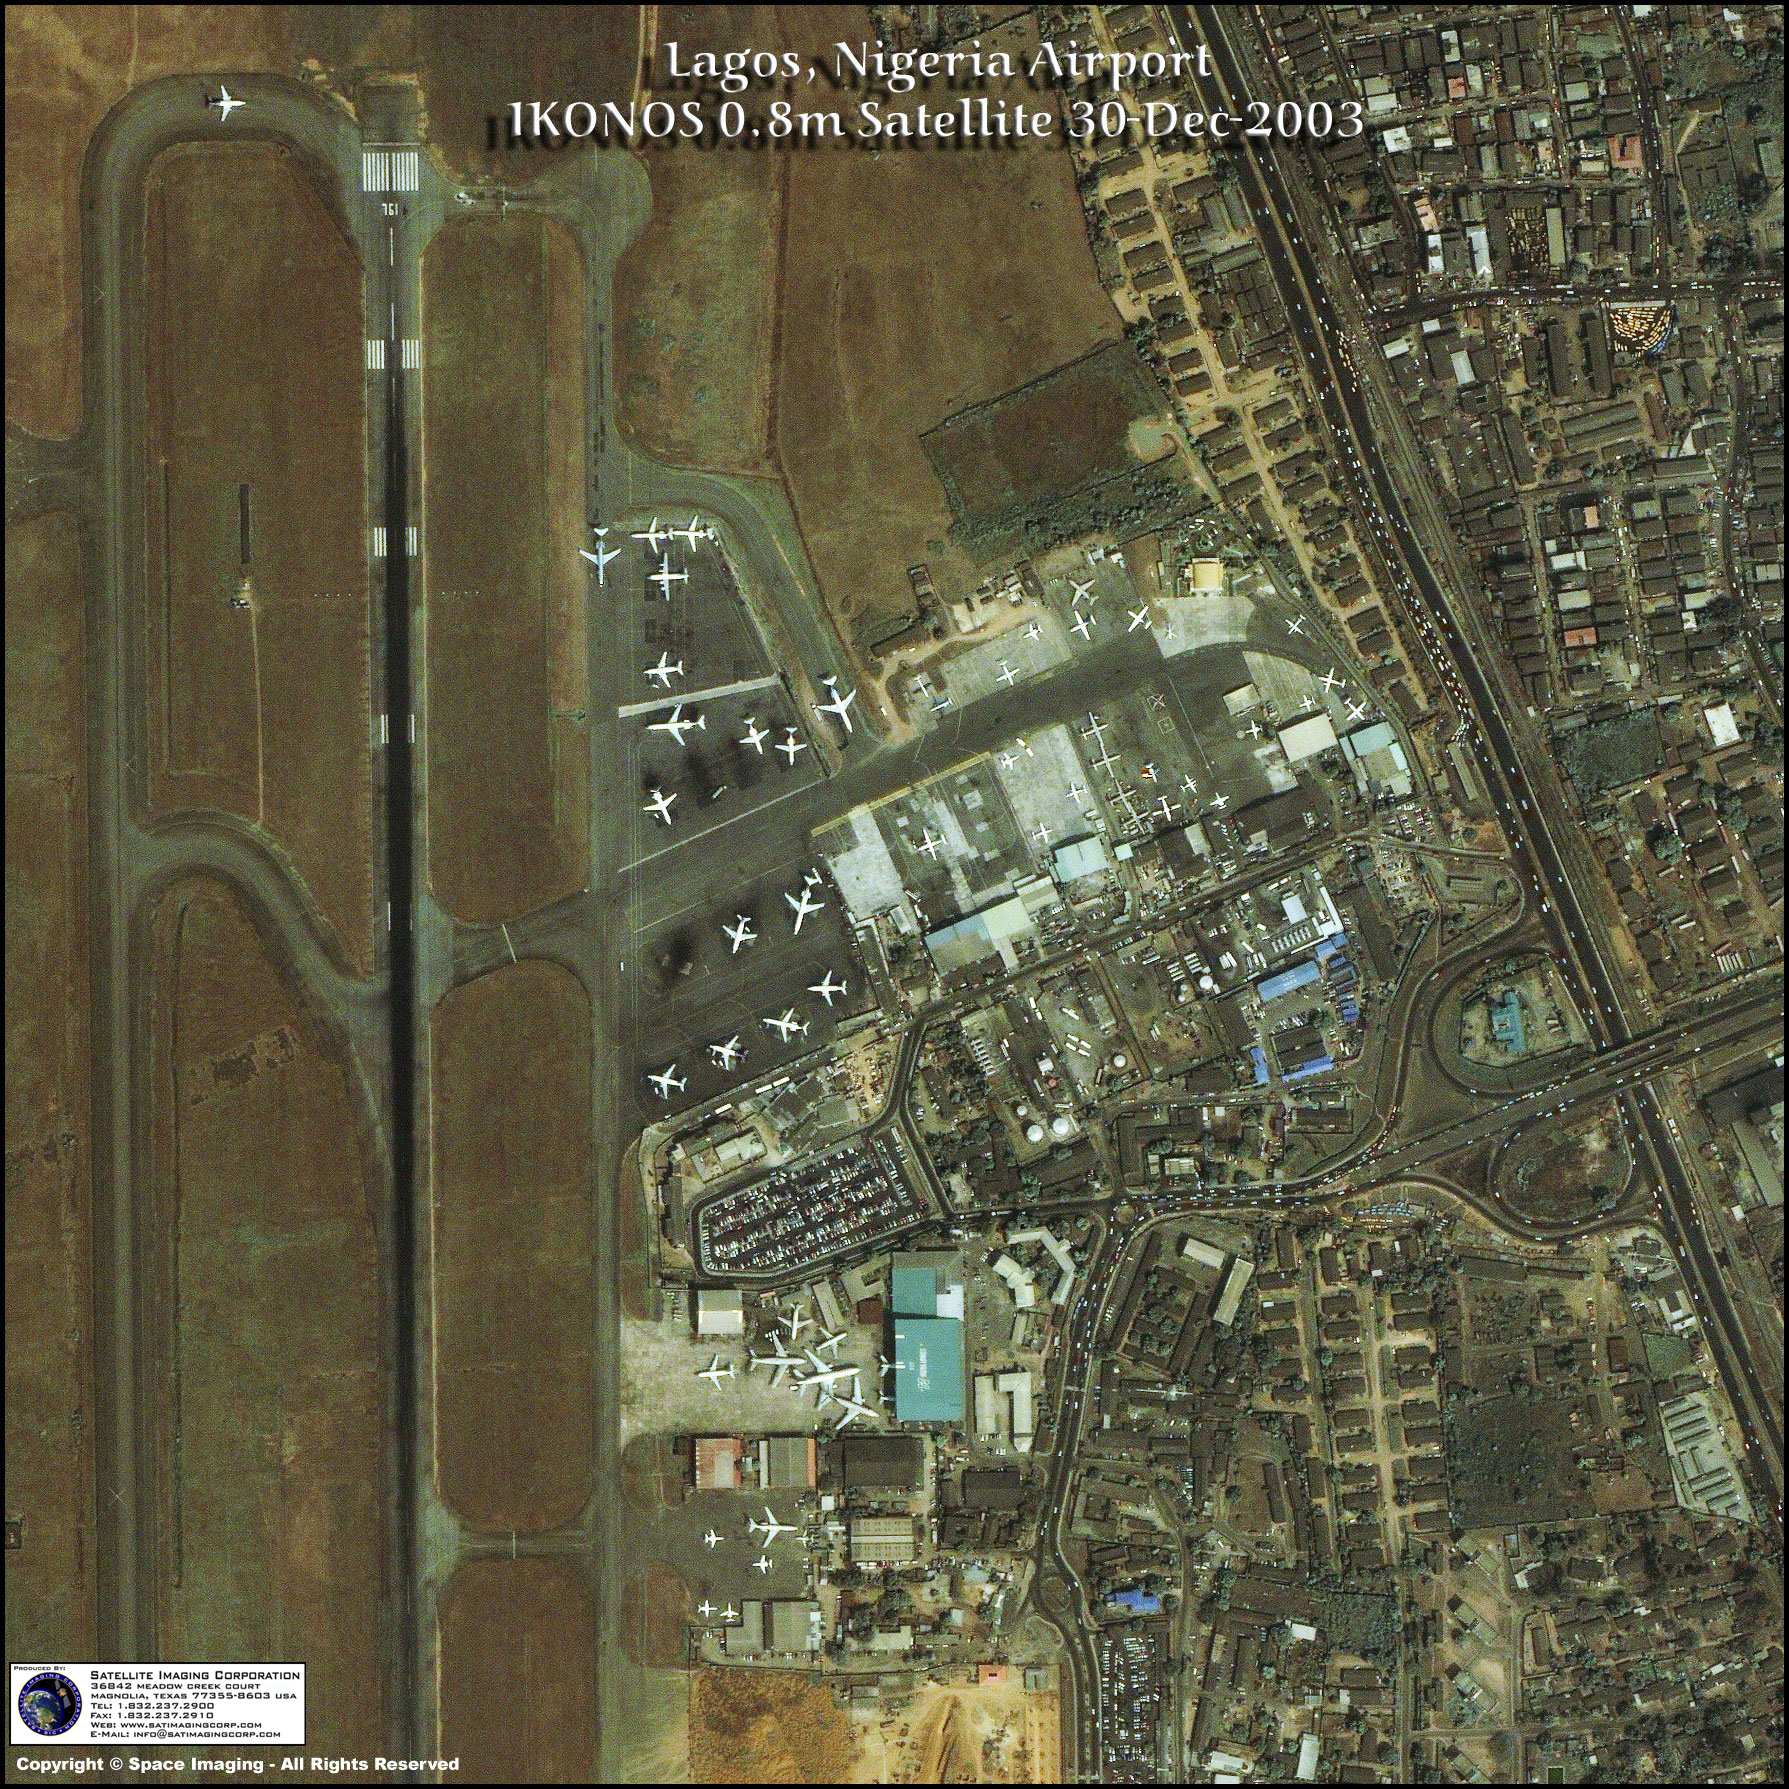 IKONOS Satellite Image Of Lagos Nigeria Satellite Imaging Corp - Satellite images of